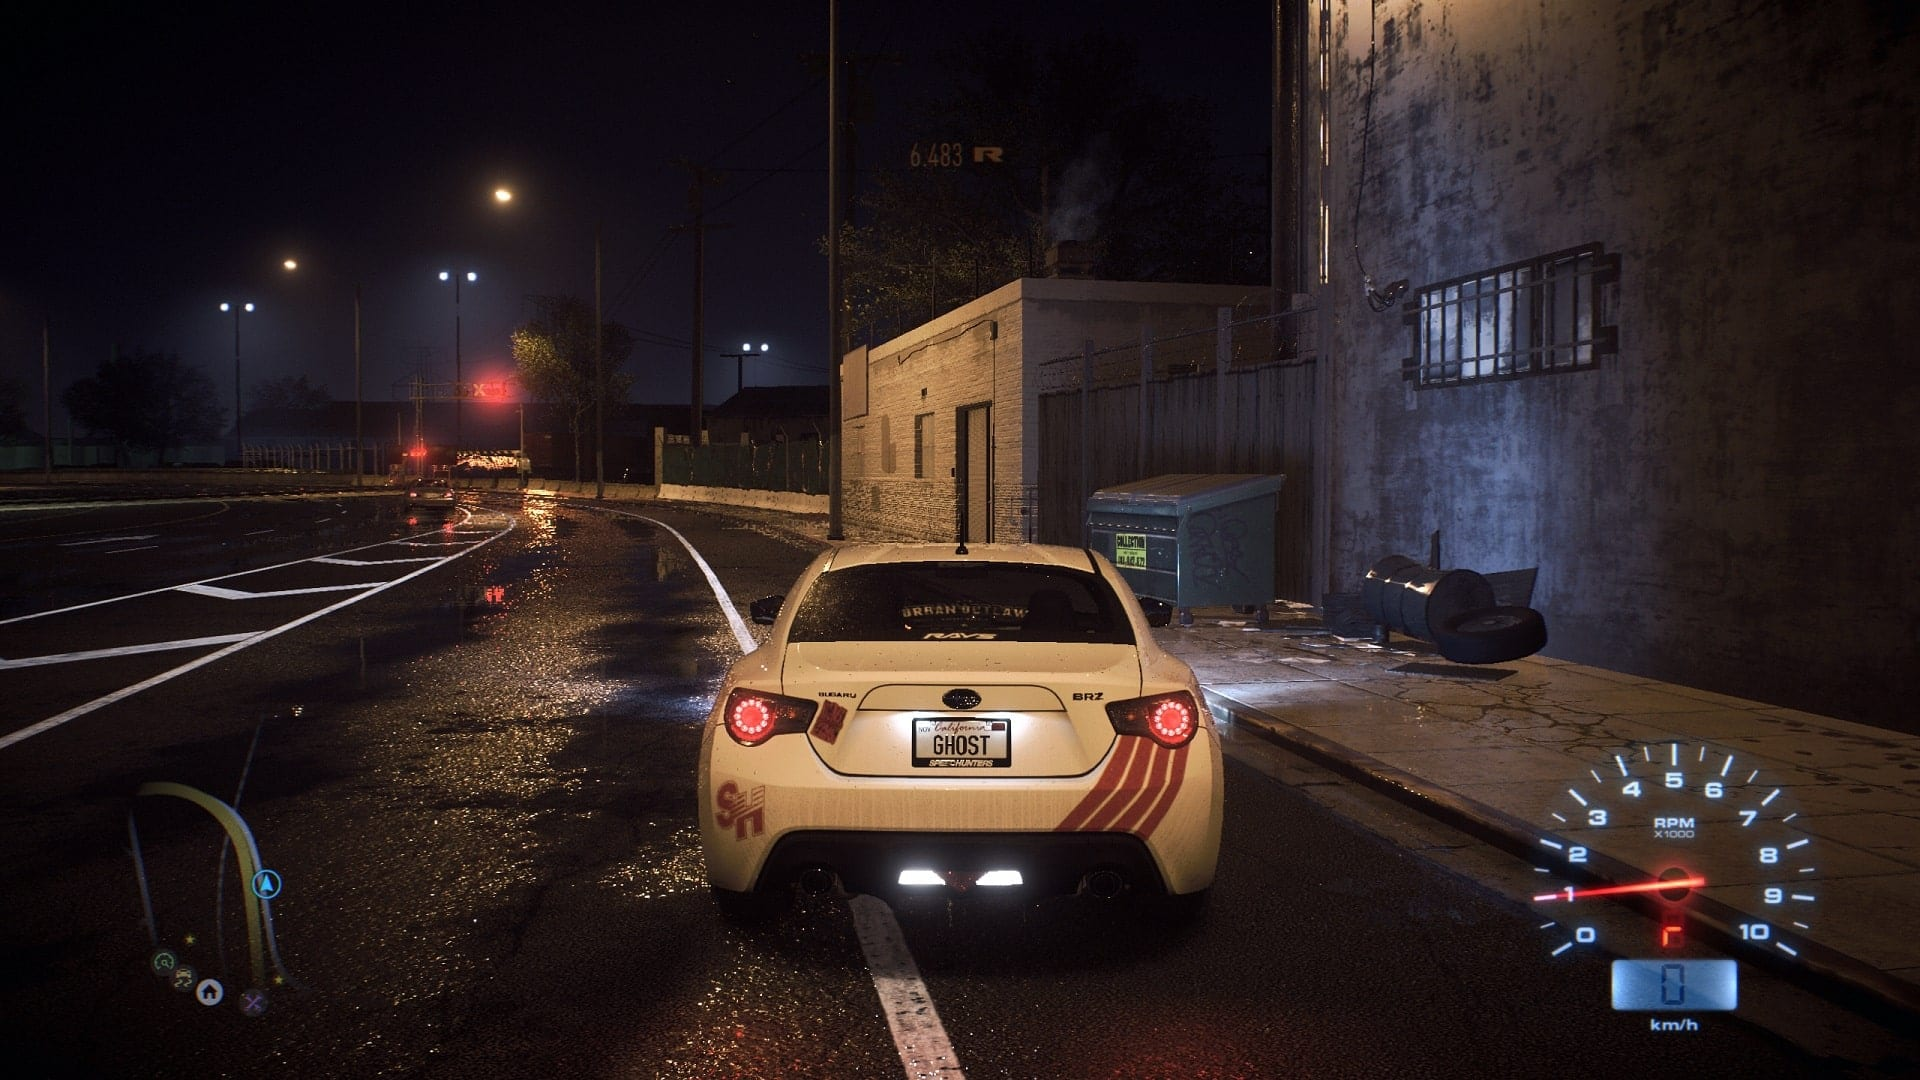 Dettaglio LOW - Need for Speed - Recensione